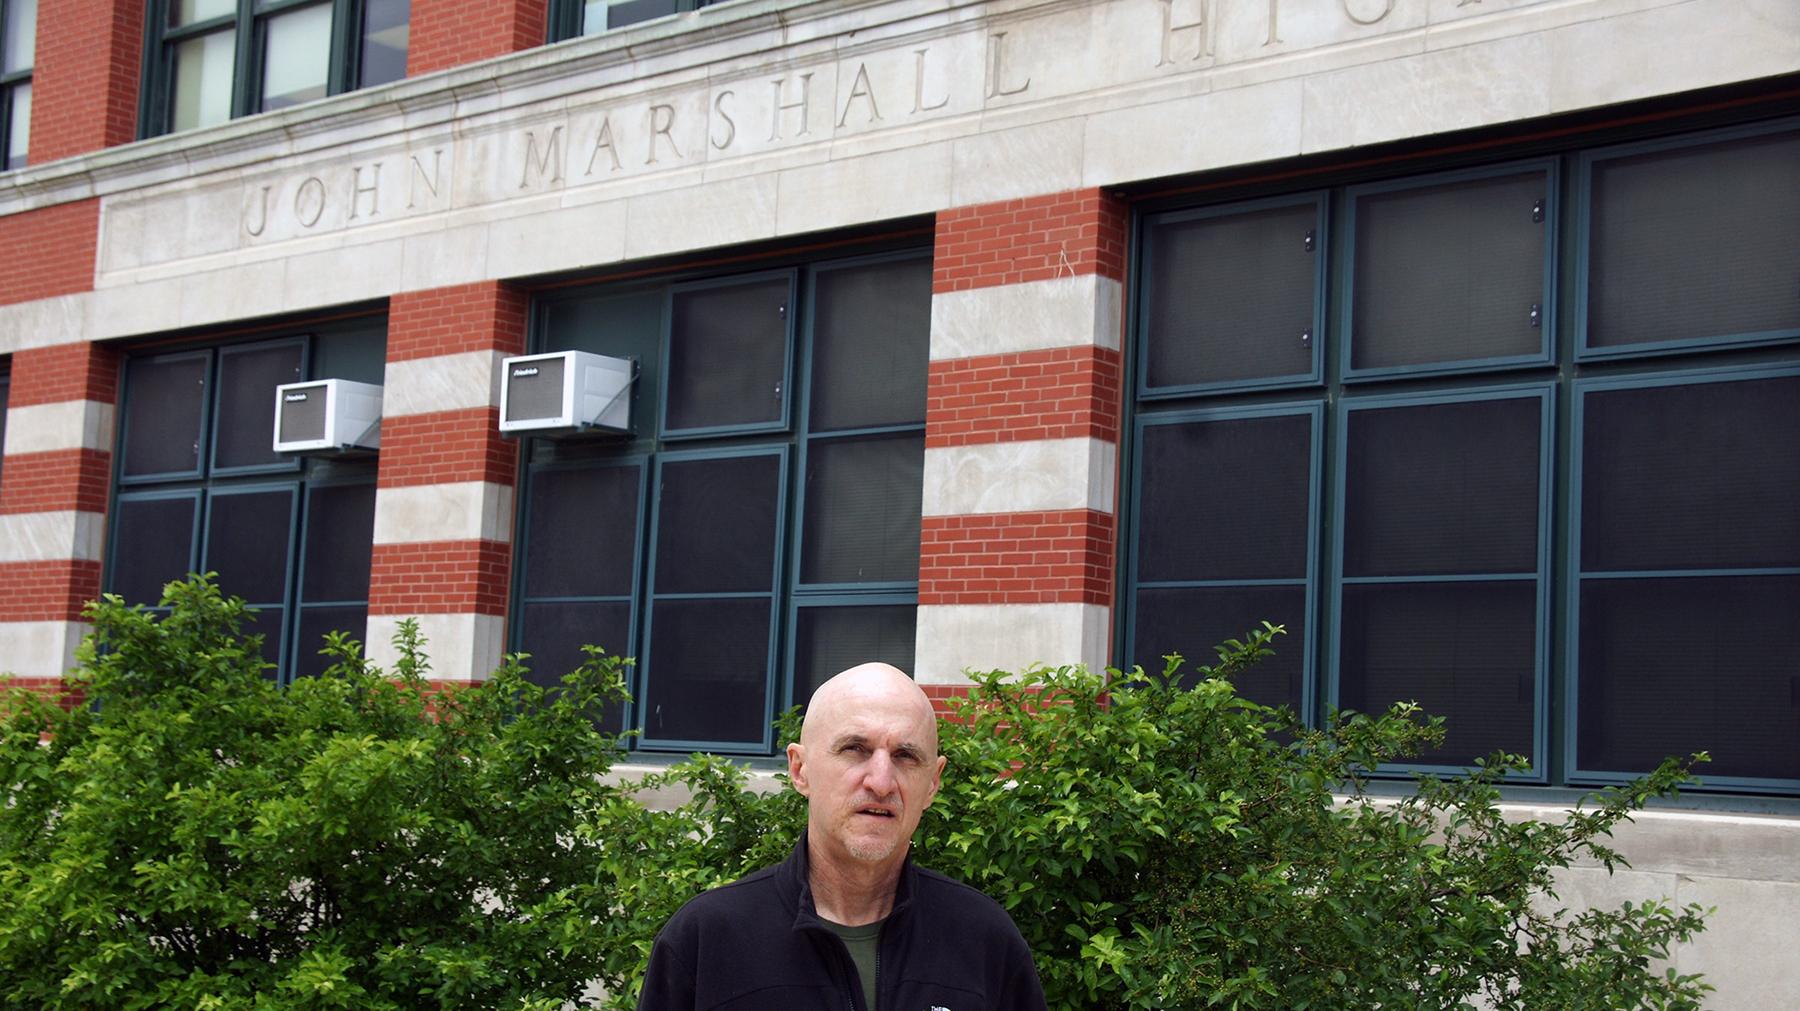 Rus Bradburd in front of John Marshall High